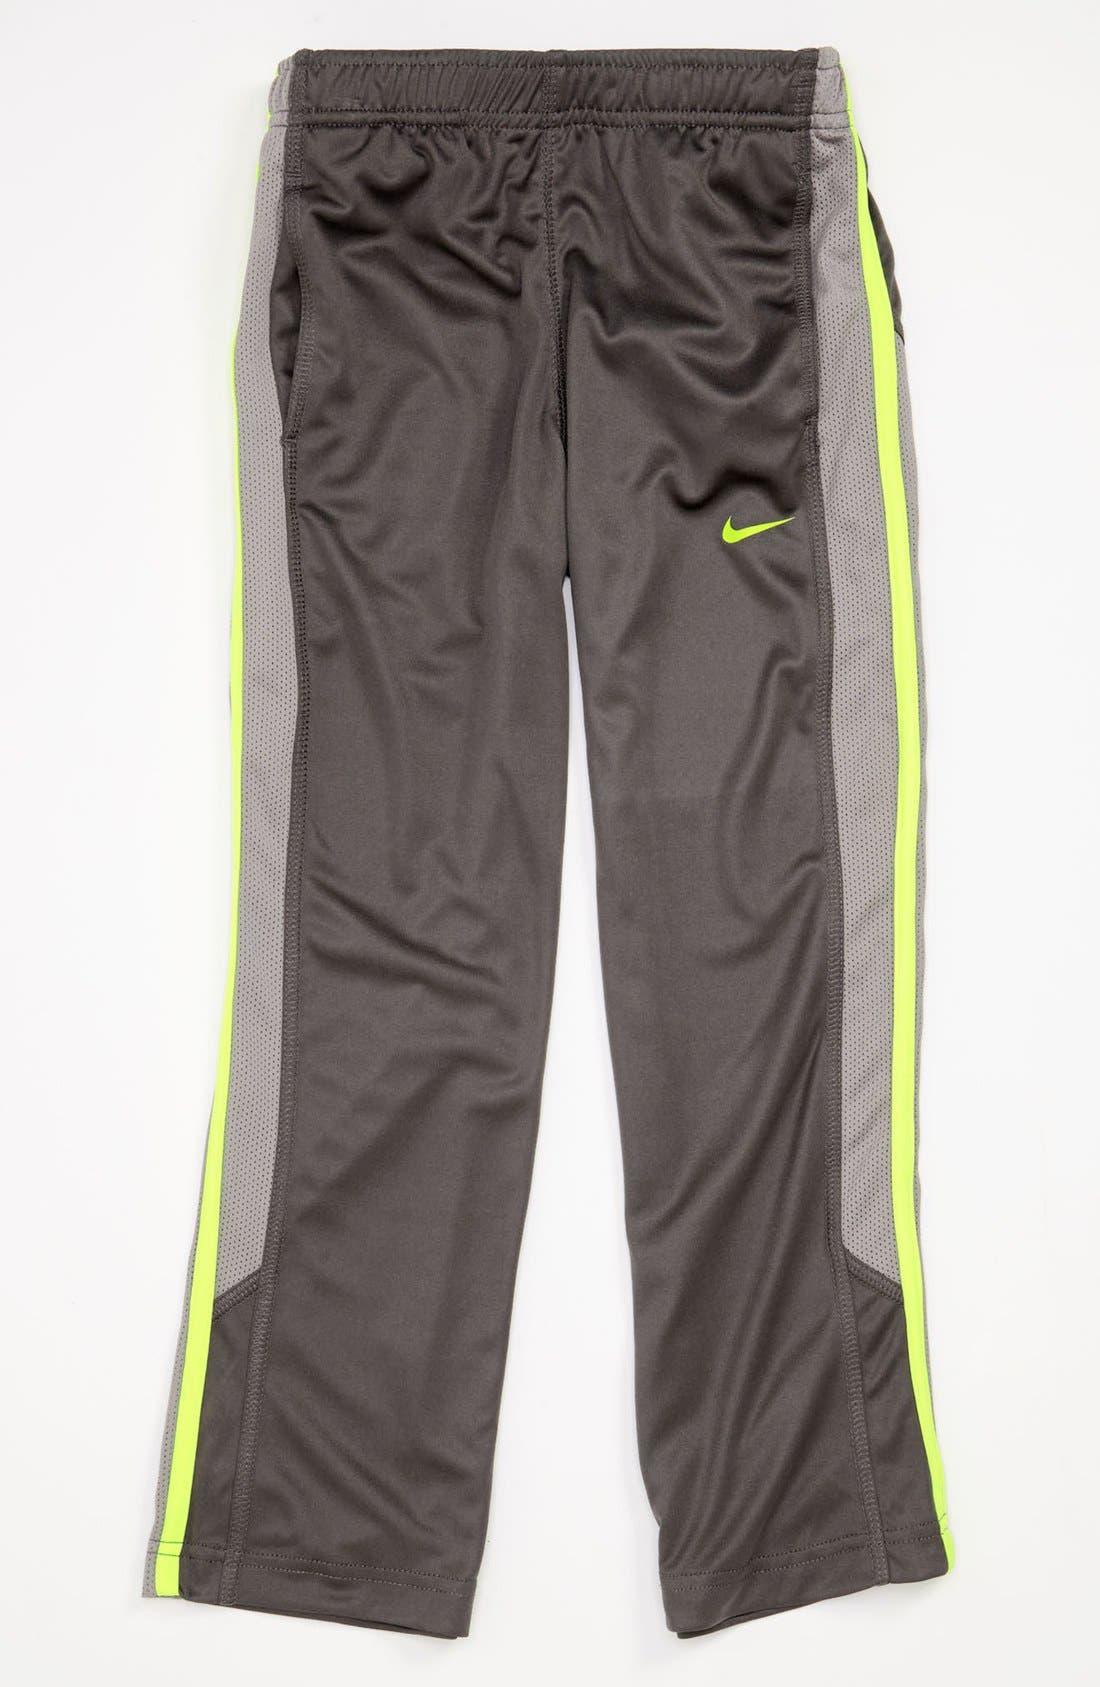 Main Image - Nike 'Lights Out' Pants (Little Boys)